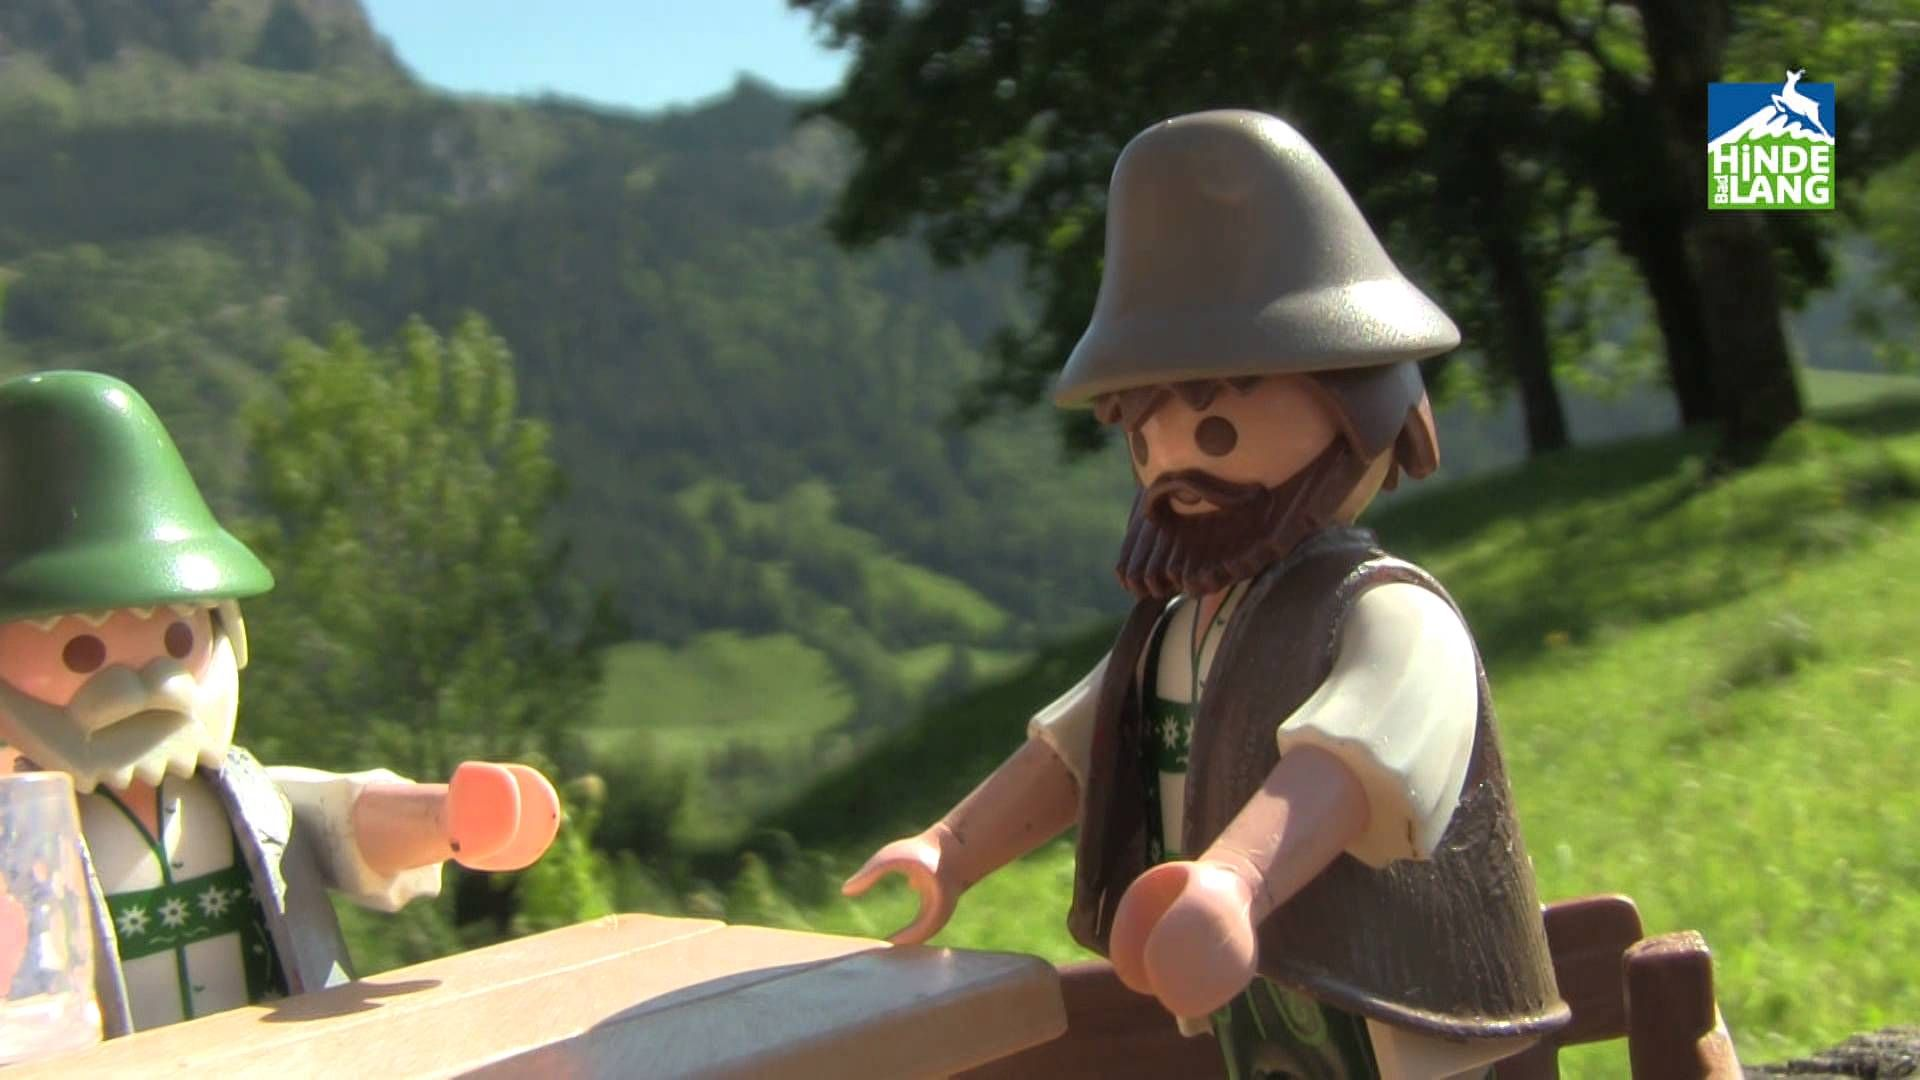 Playmobil Movie - #Urlaub im #Allgaeu   Allgäu urlaub, Urlaub, Playmobil